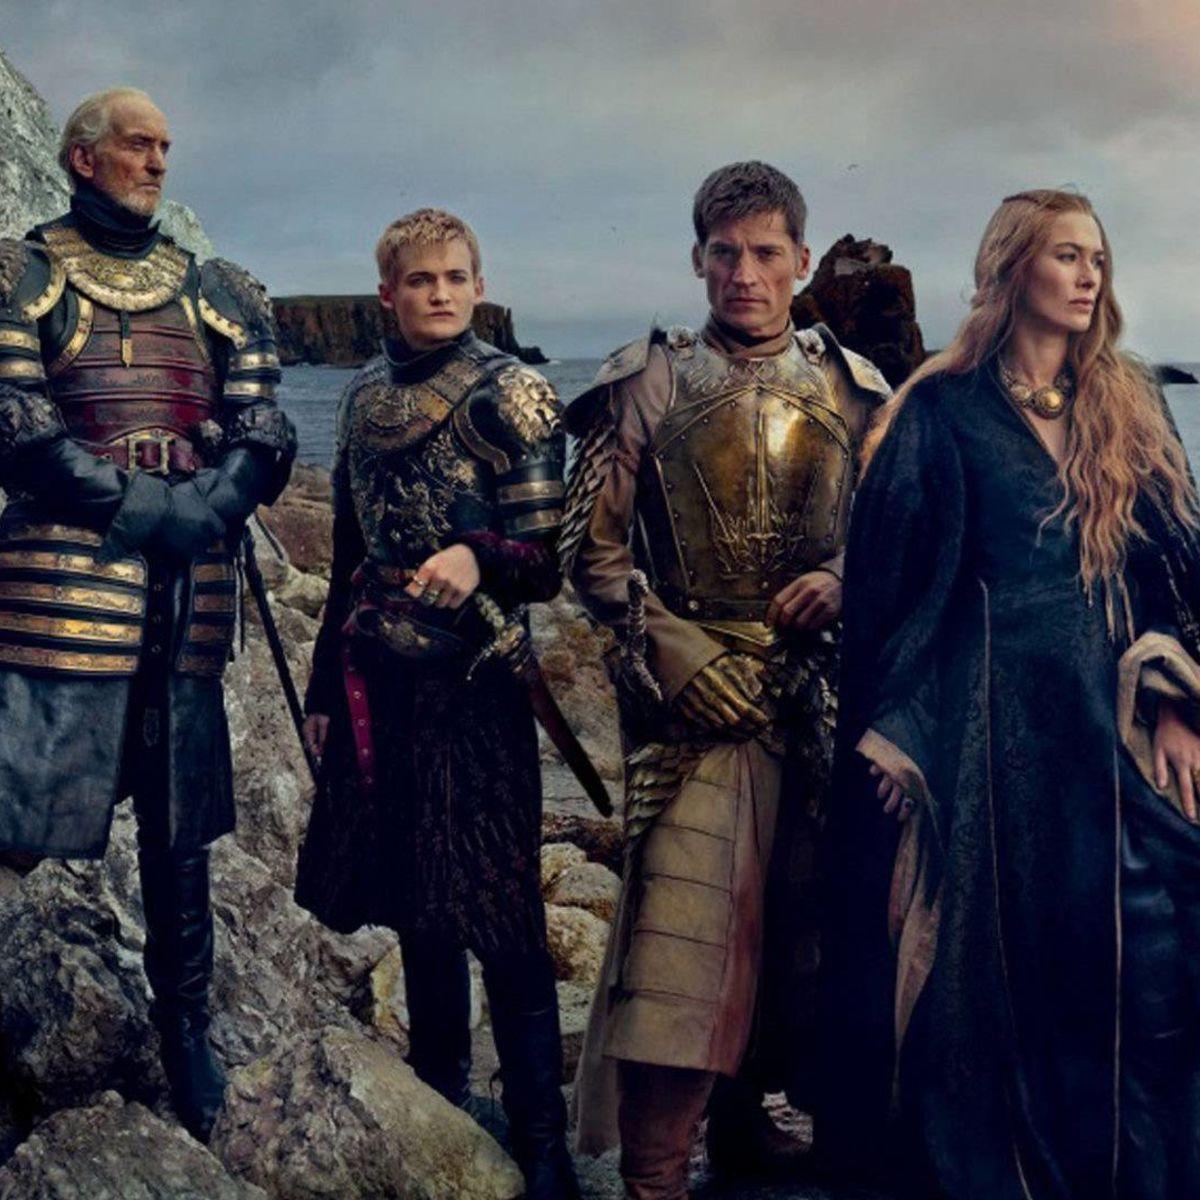 game-of-thrones-cast.jpg